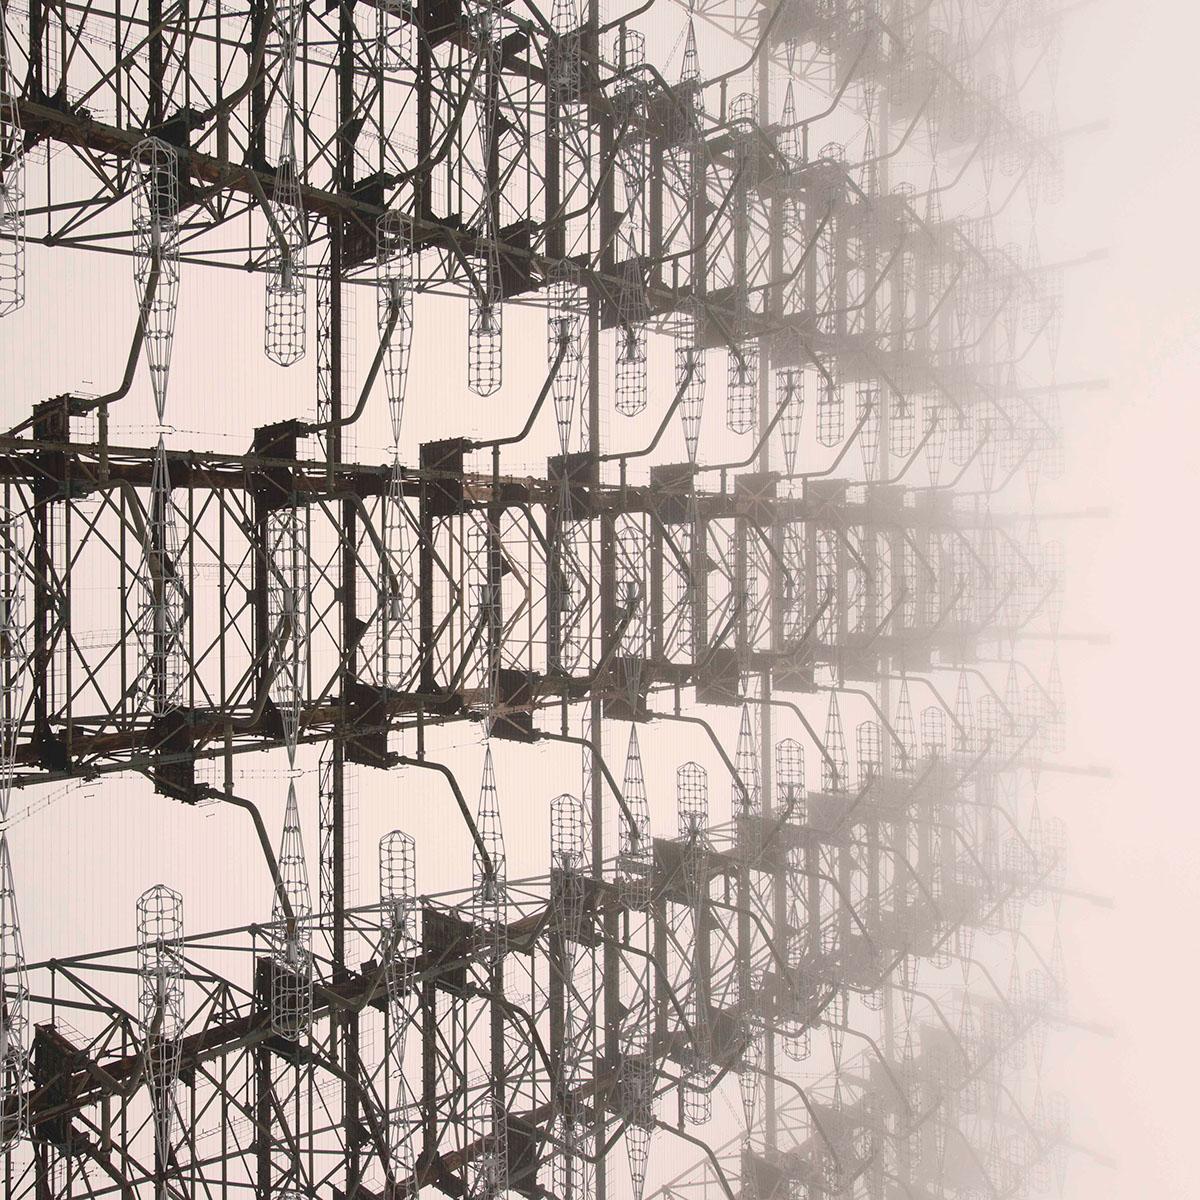 Cold War urbex abandoned antenna ukraine chernobyl duga details rust fog megastructure winter STEAMPUNK Monochromatic